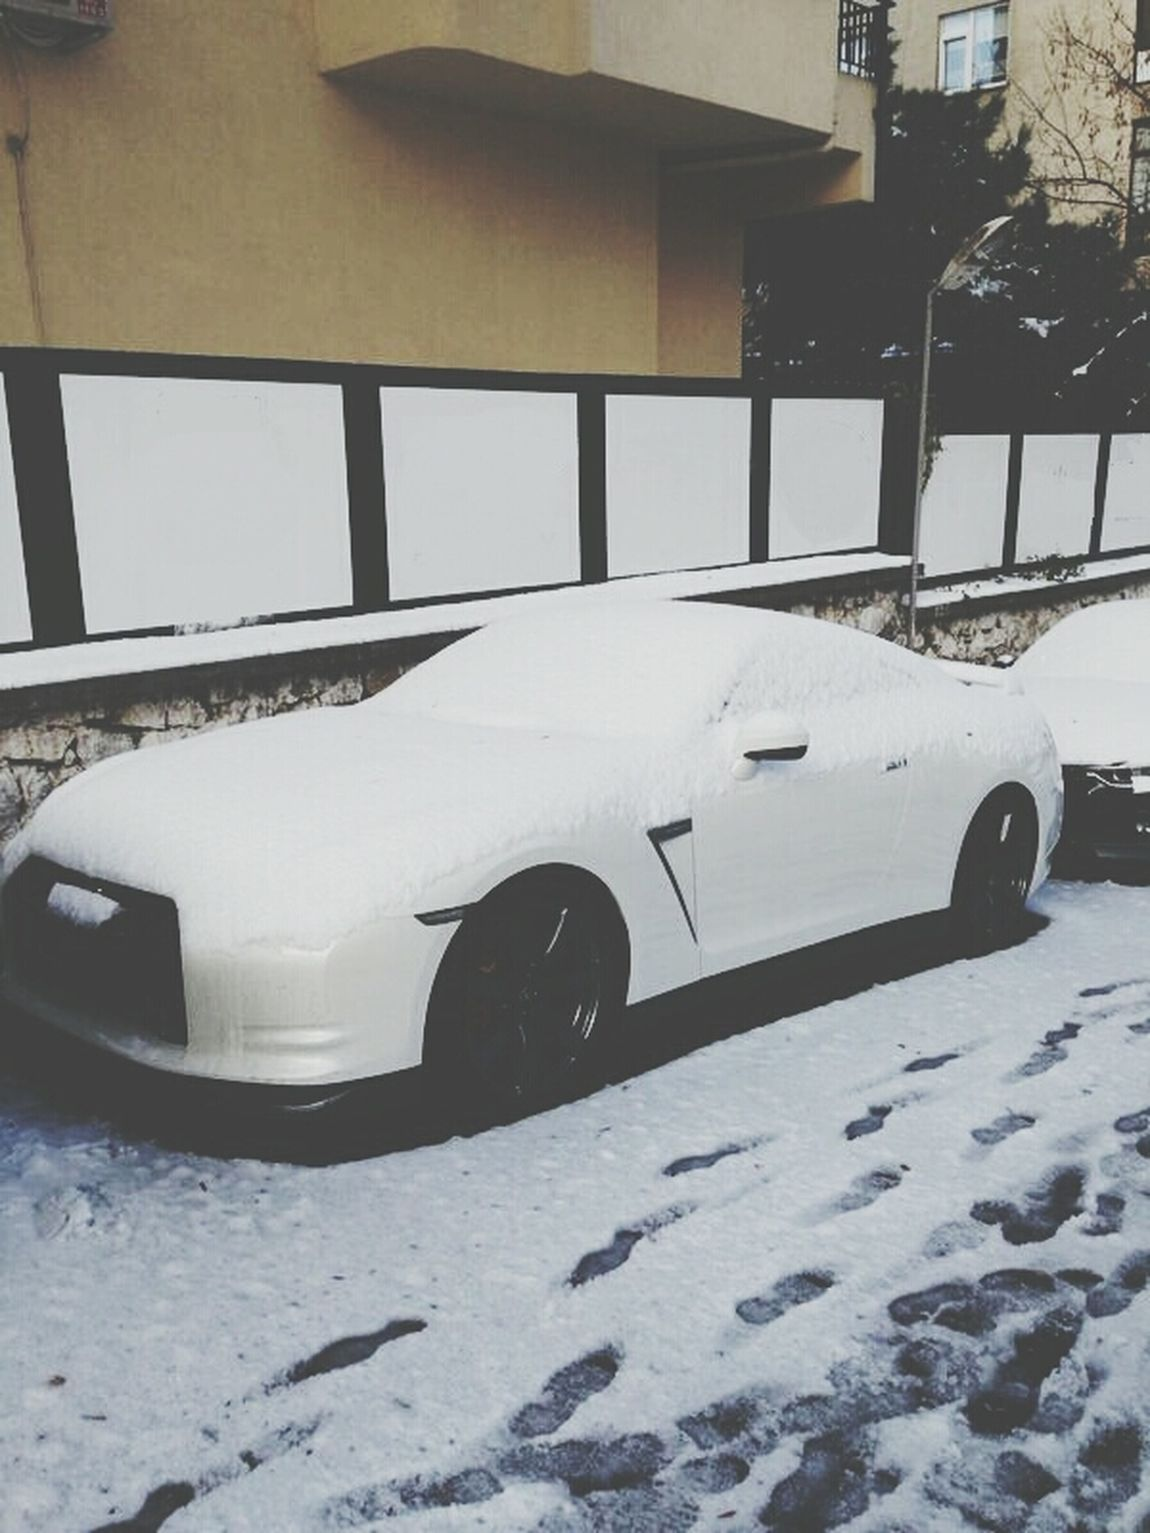 Garage Snow R35 GTR Istanbul